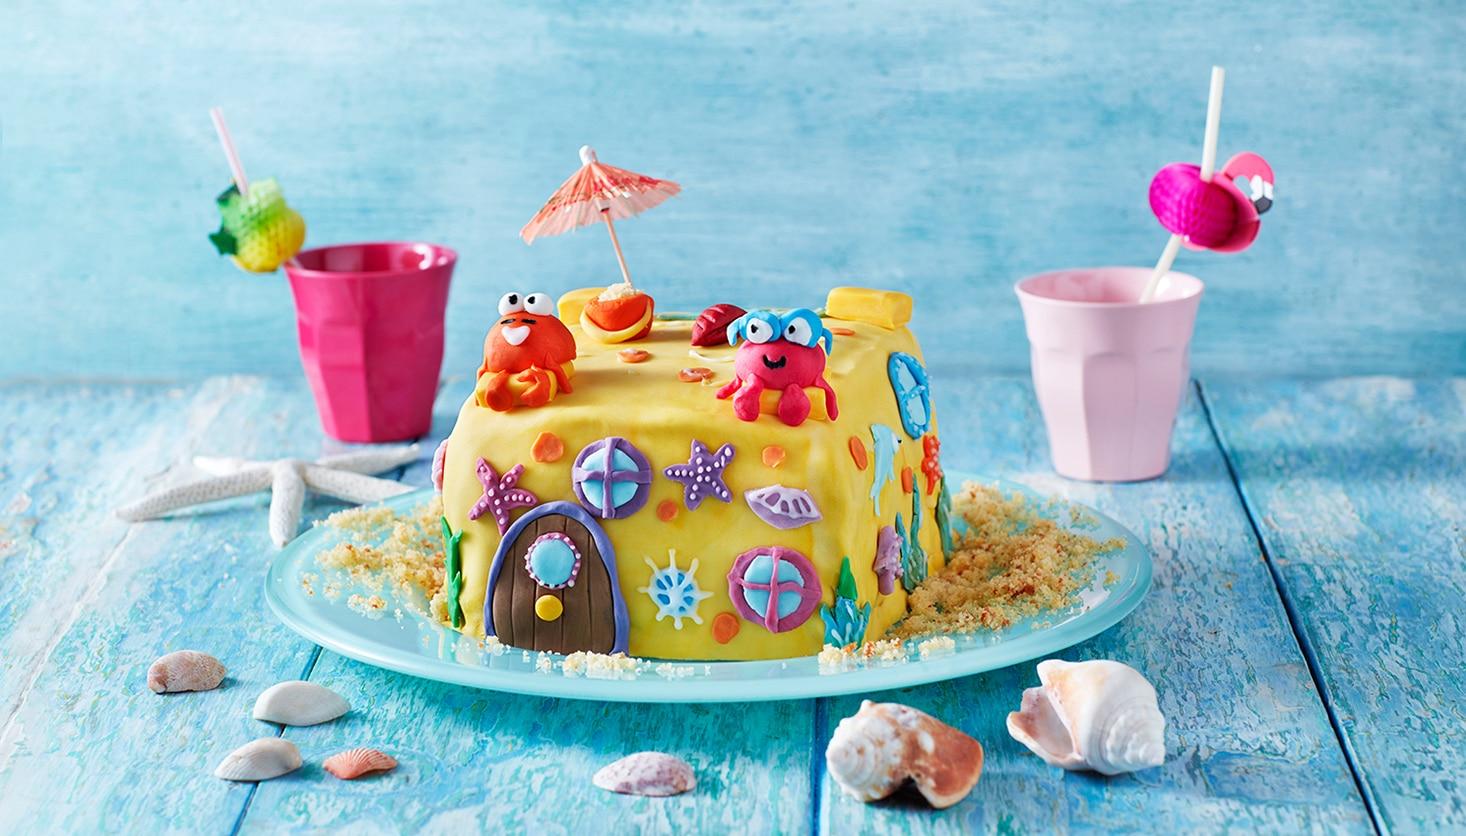 The Sandcastle Cake Hey Duggee